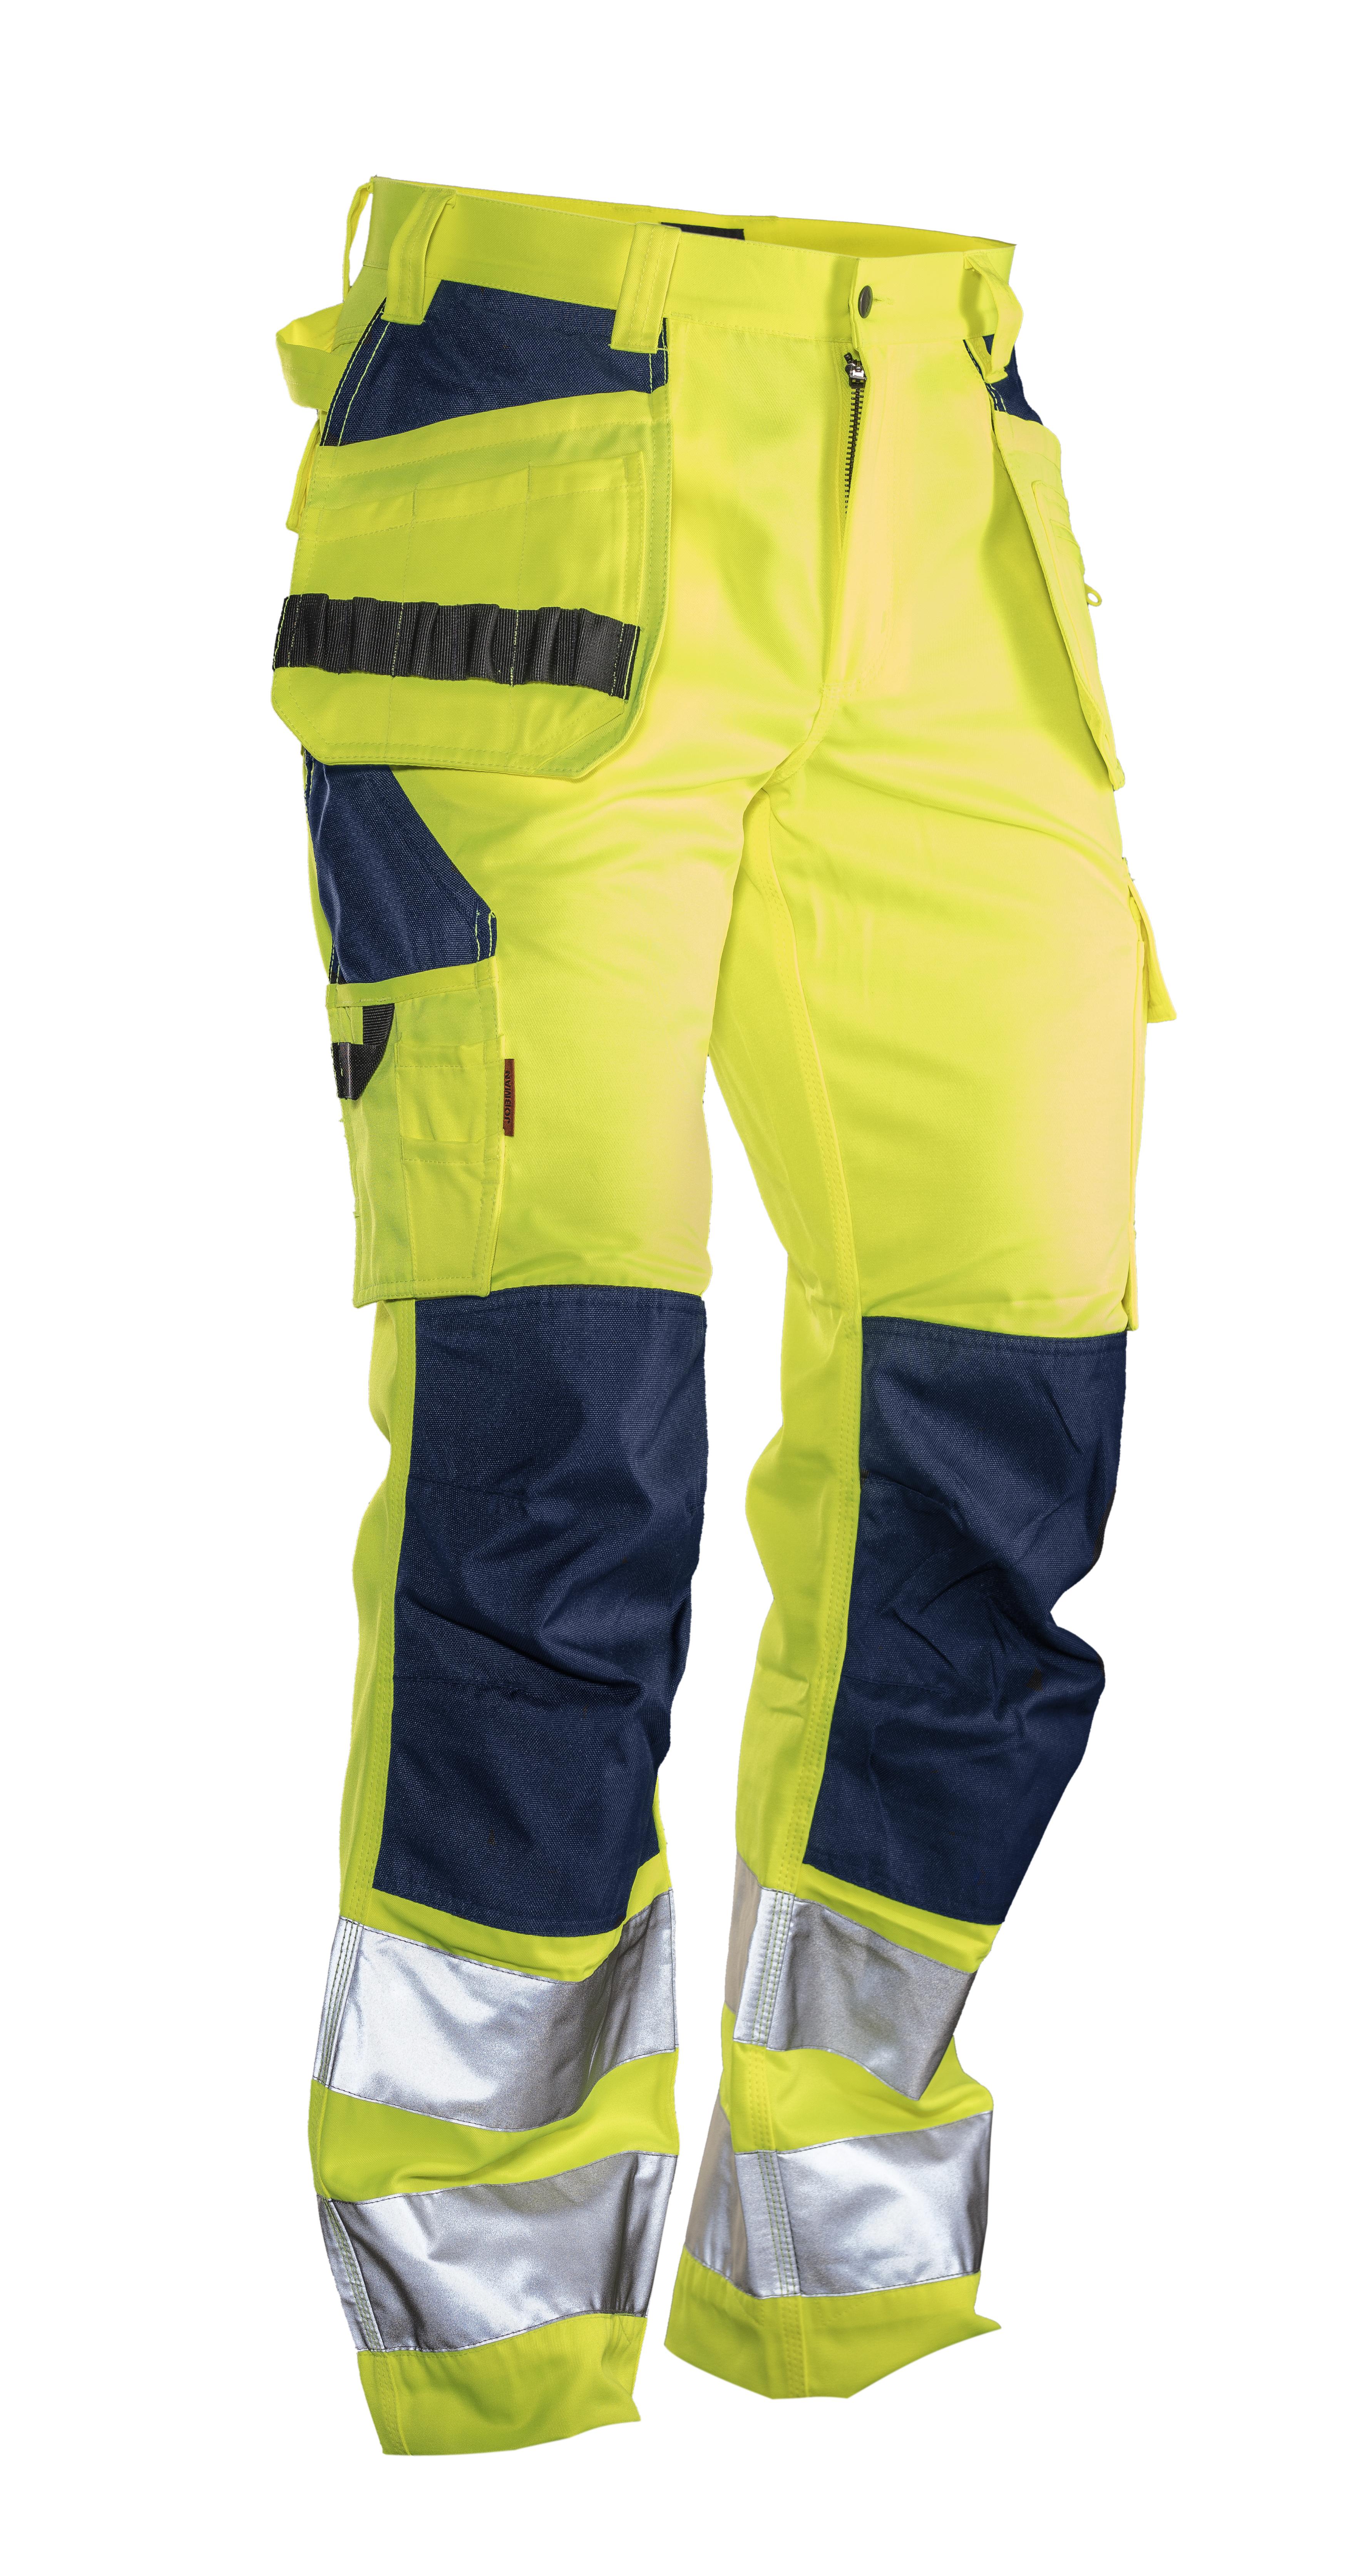 2377 PANTALON D'ARTISAN HI-VIS C42 jaune/bleu marine